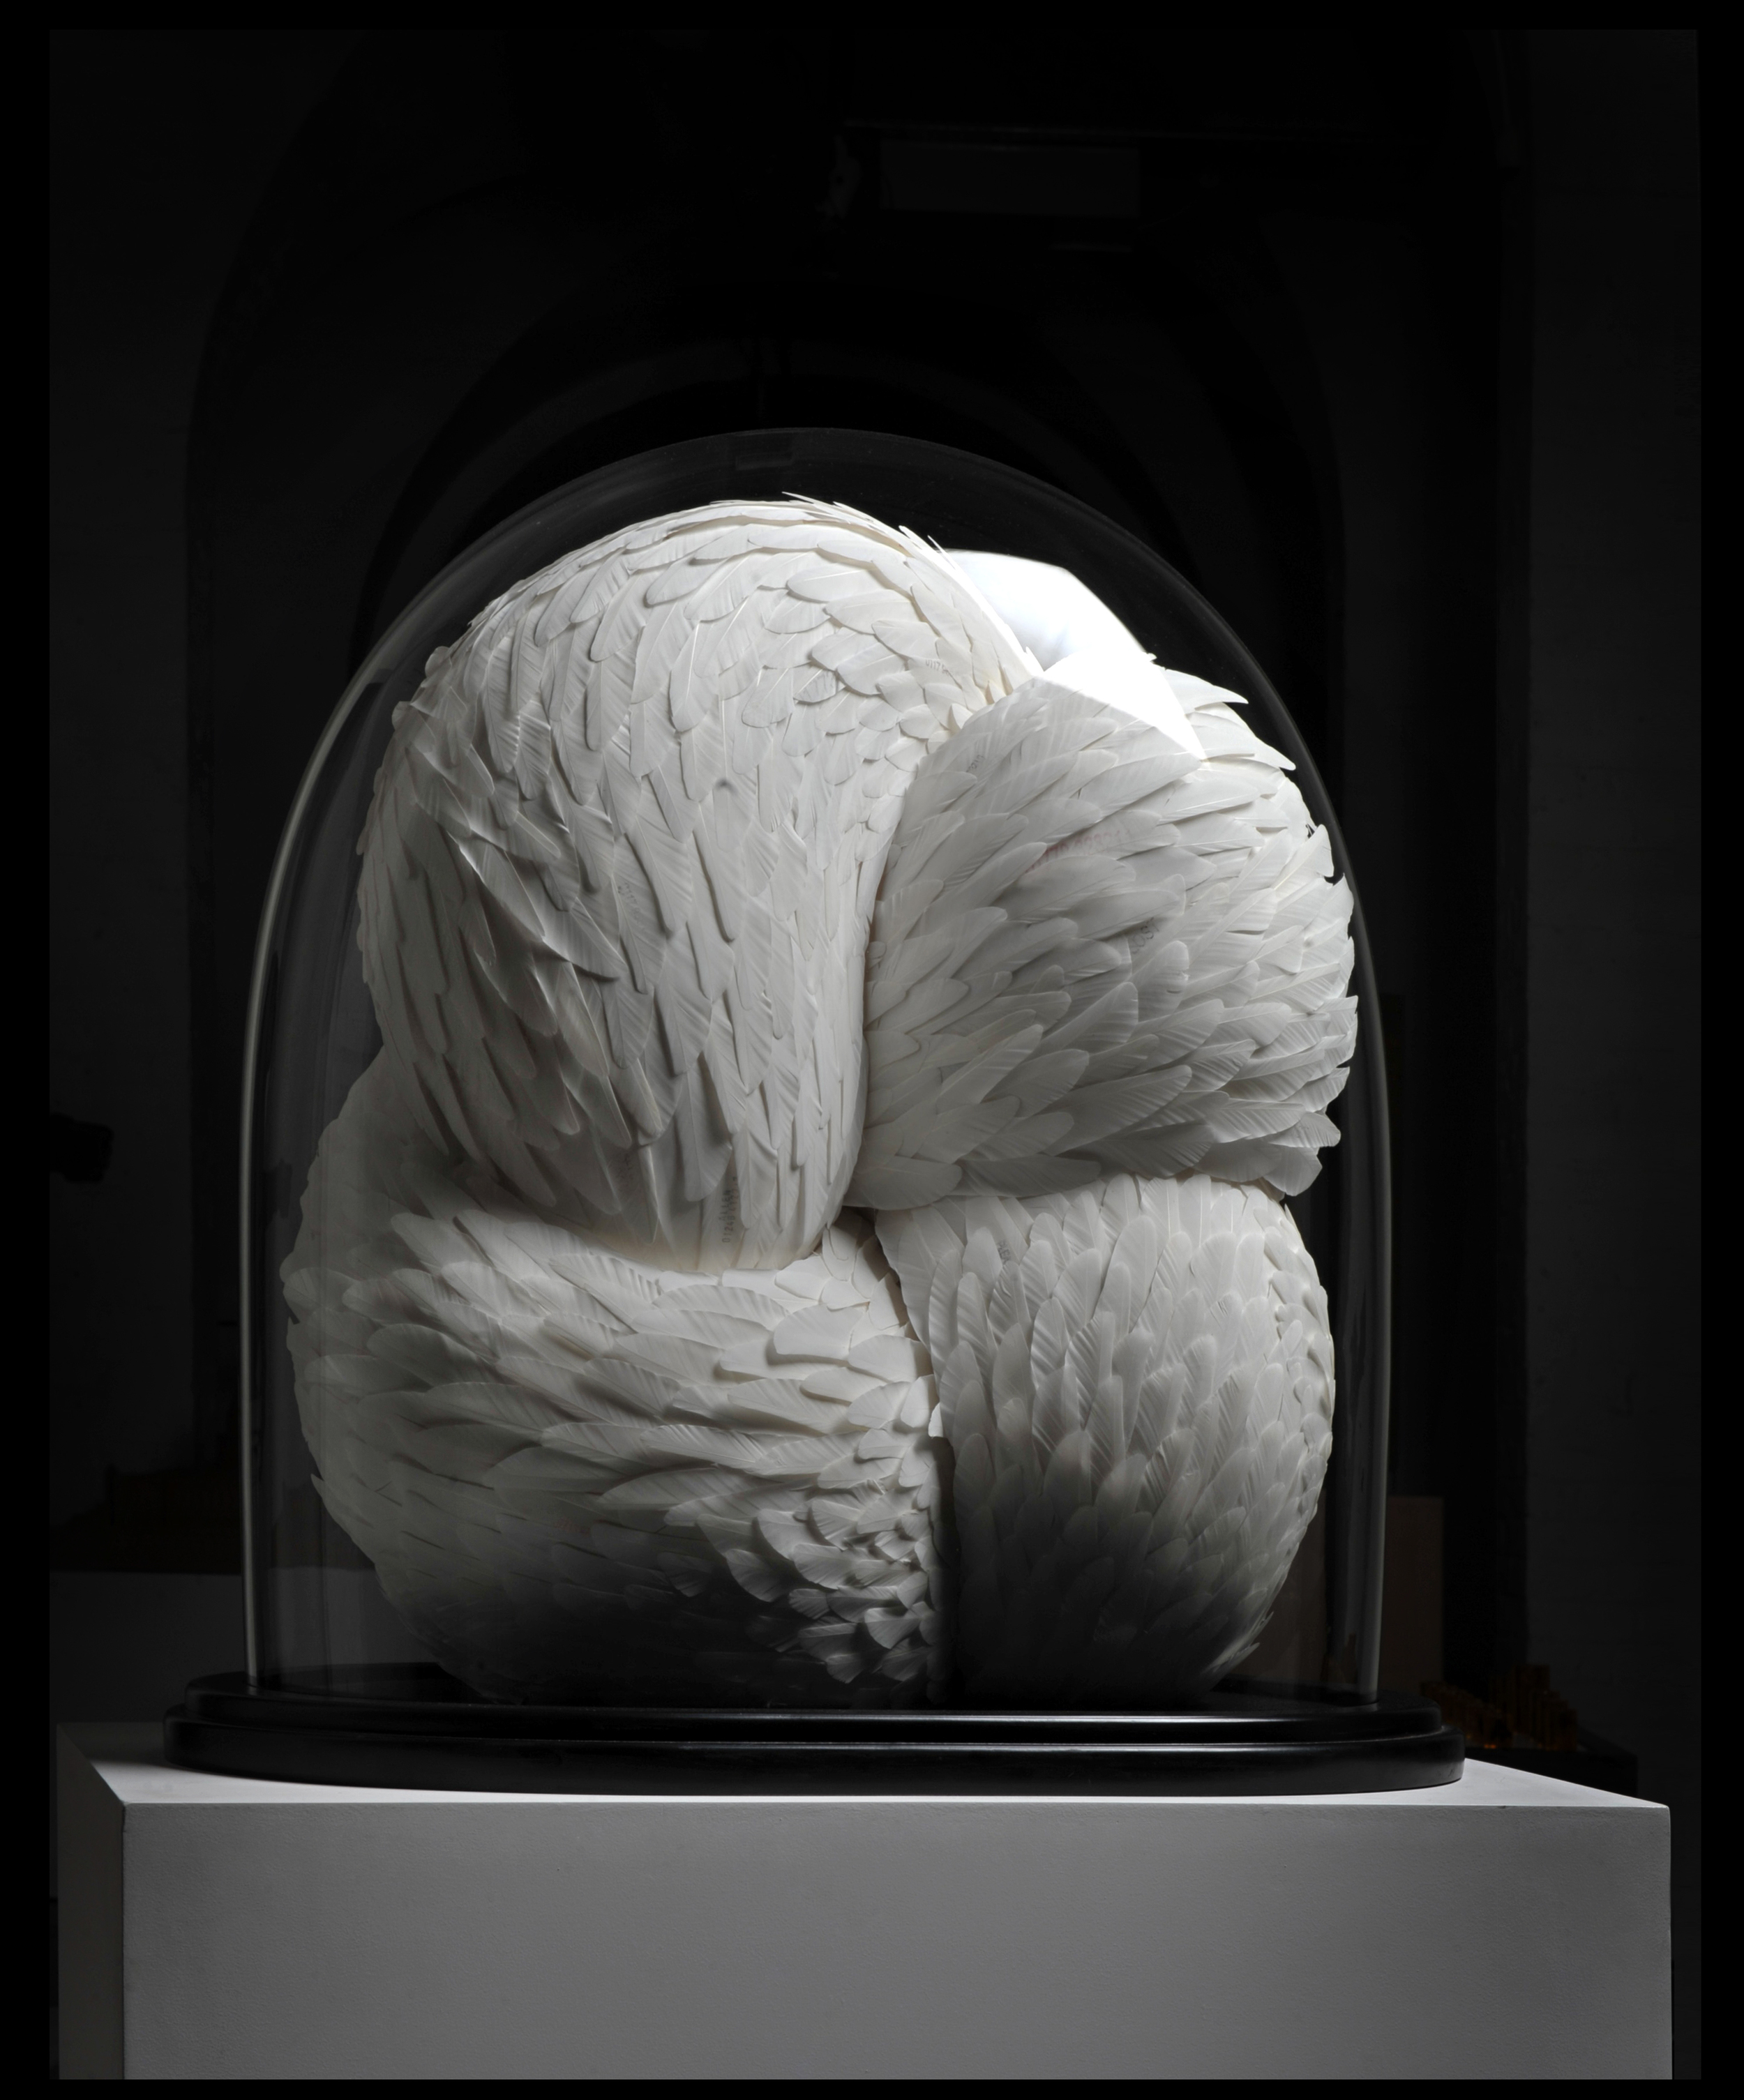 Stifle, 2009, Kate MccGwire